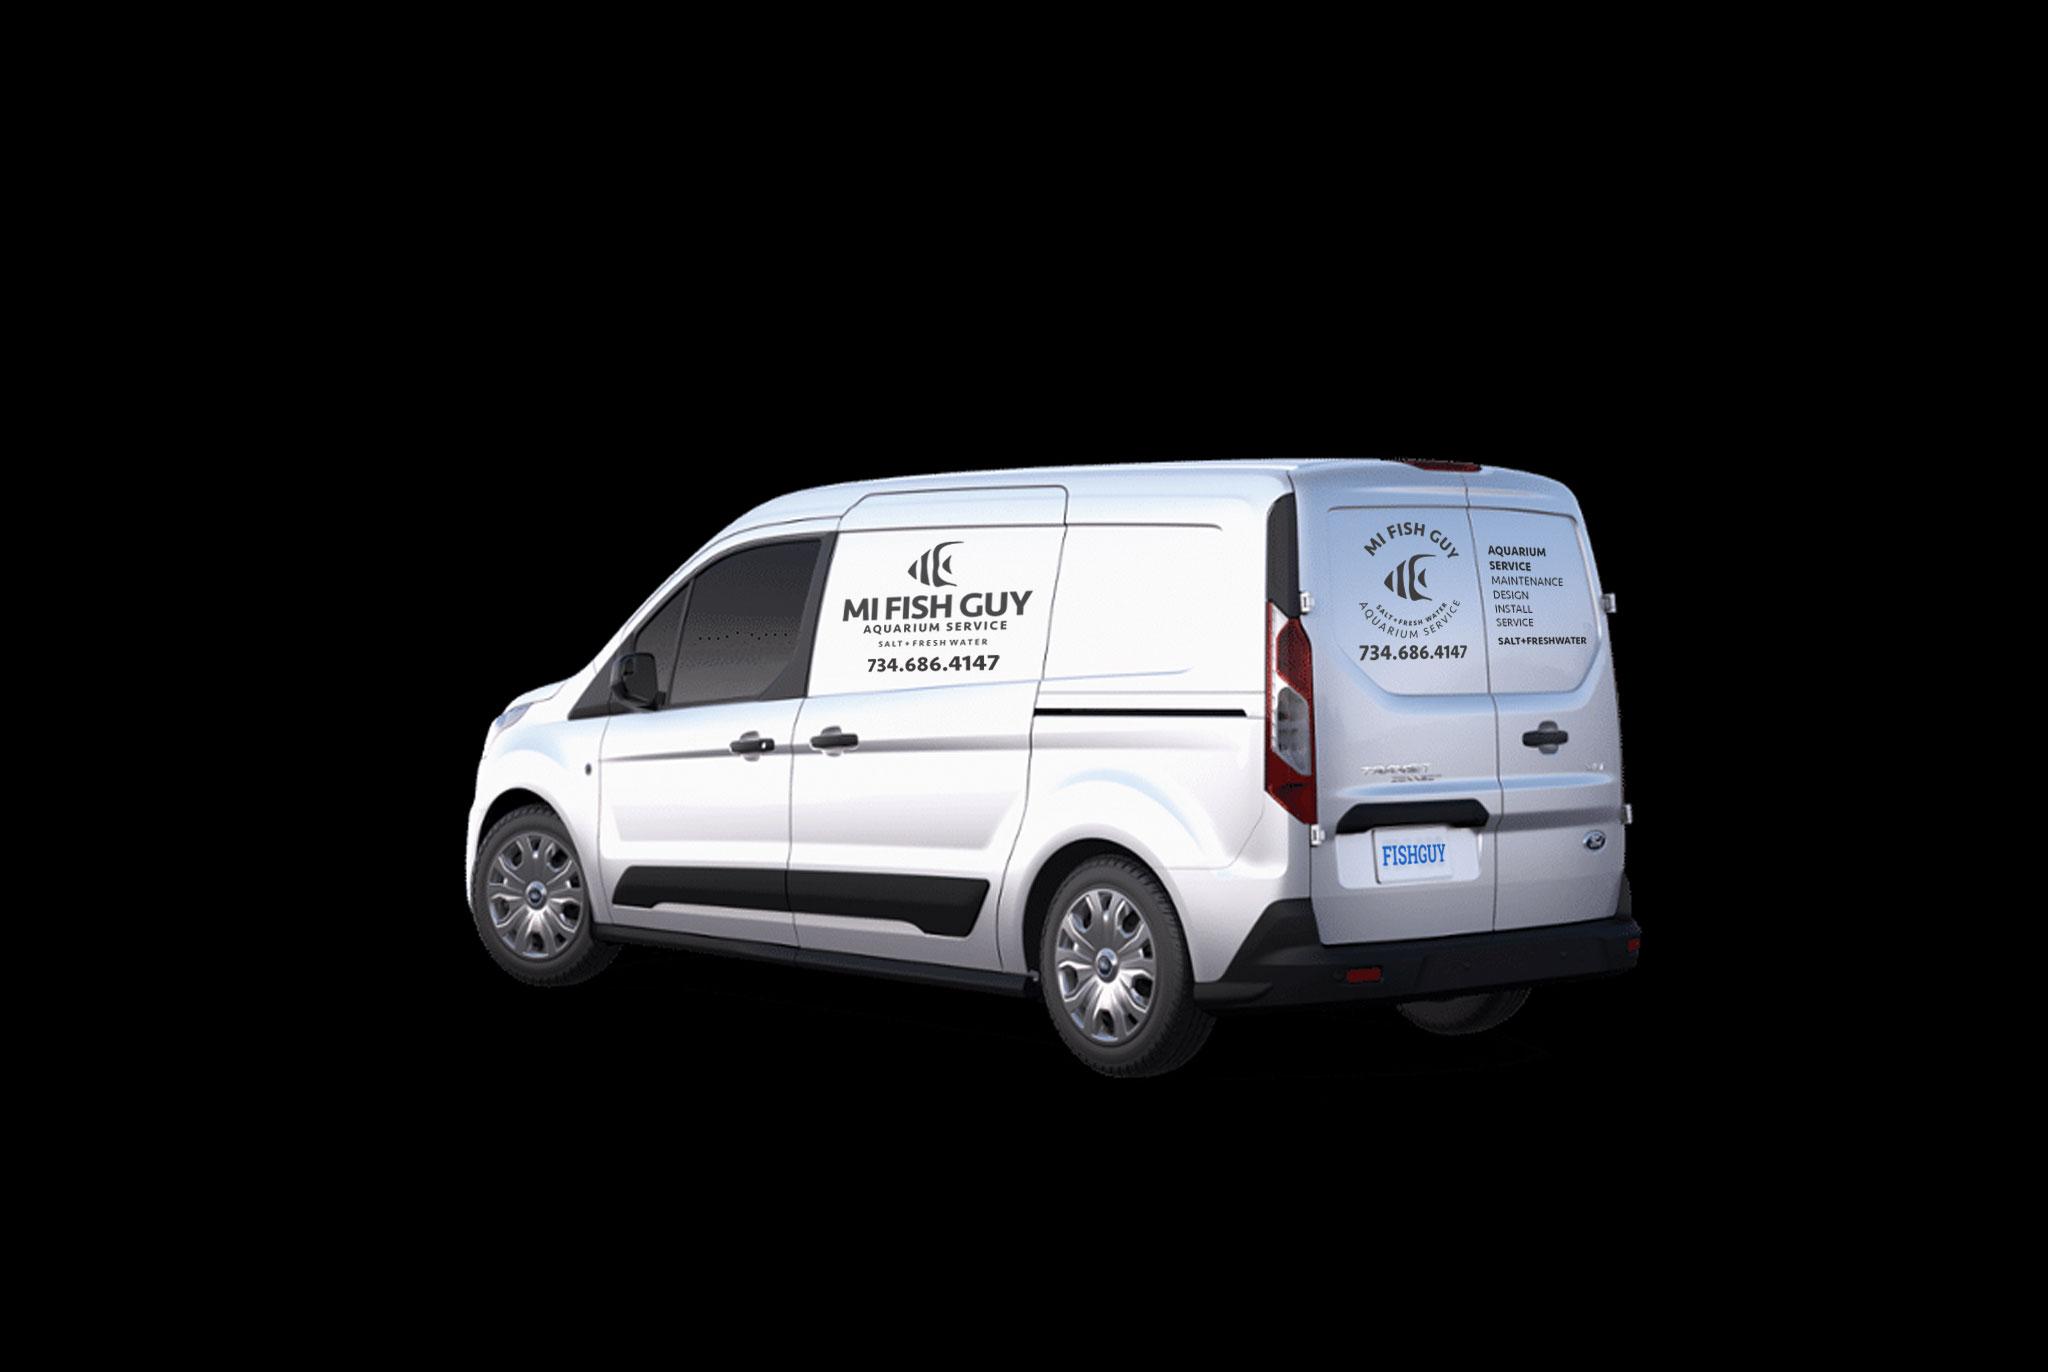 MI Fish Guy logo, logo design, branded logo, branding on van, vehicle graphics